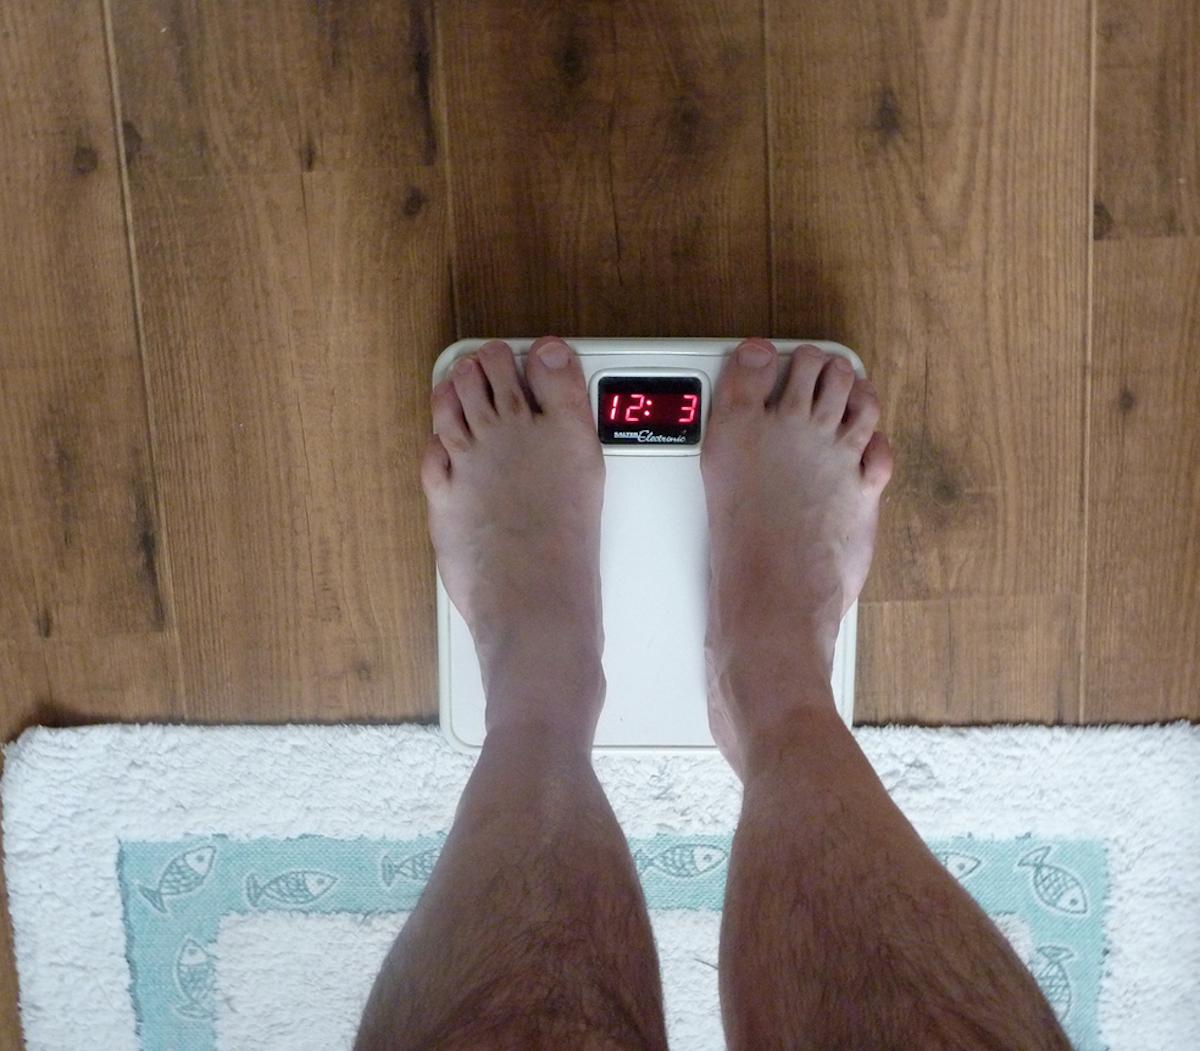 Kampf zur Gewichtsreduktion